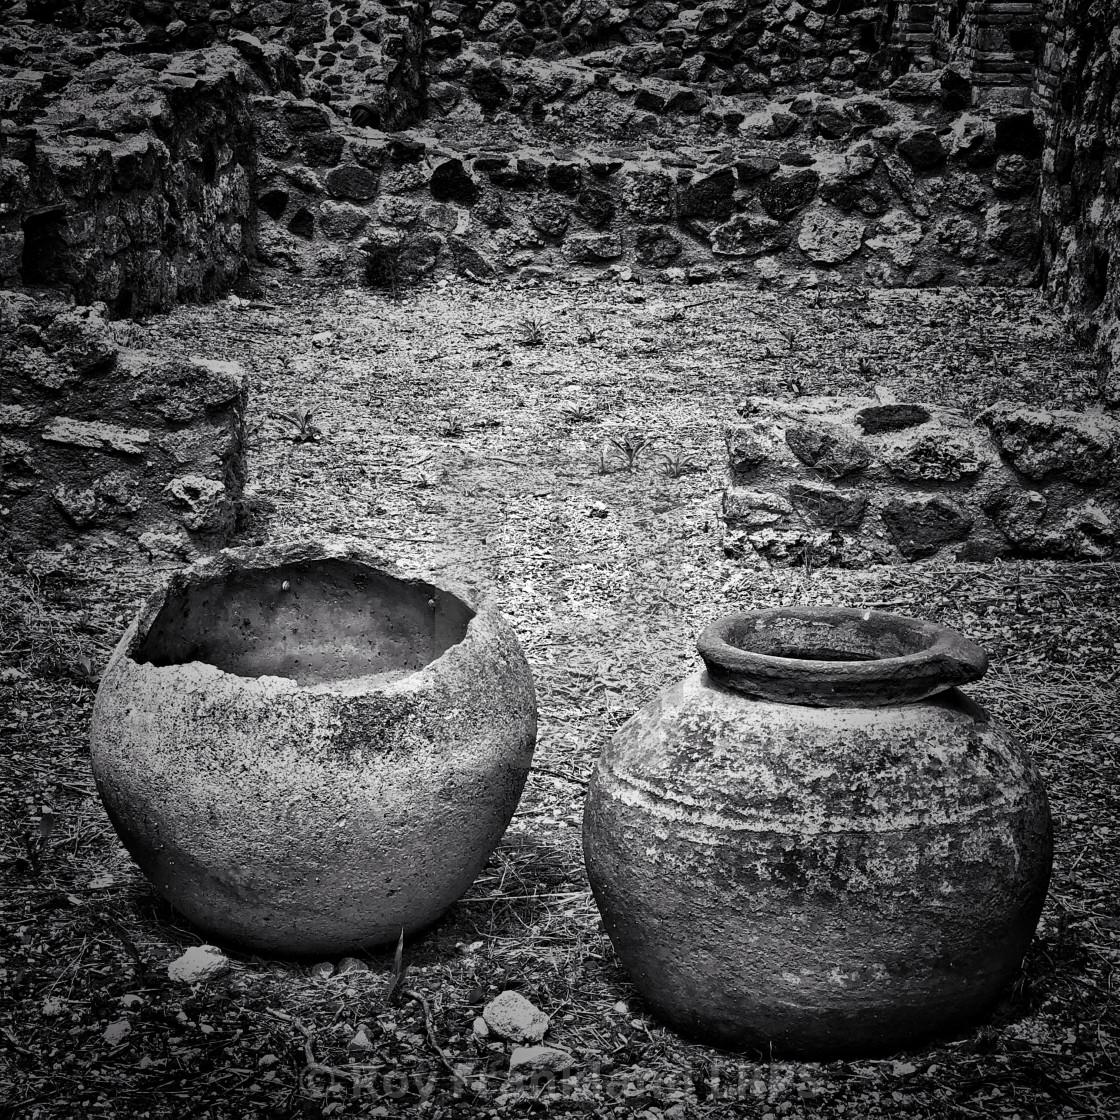 """Ancient Roman pots, mono"" stock image"